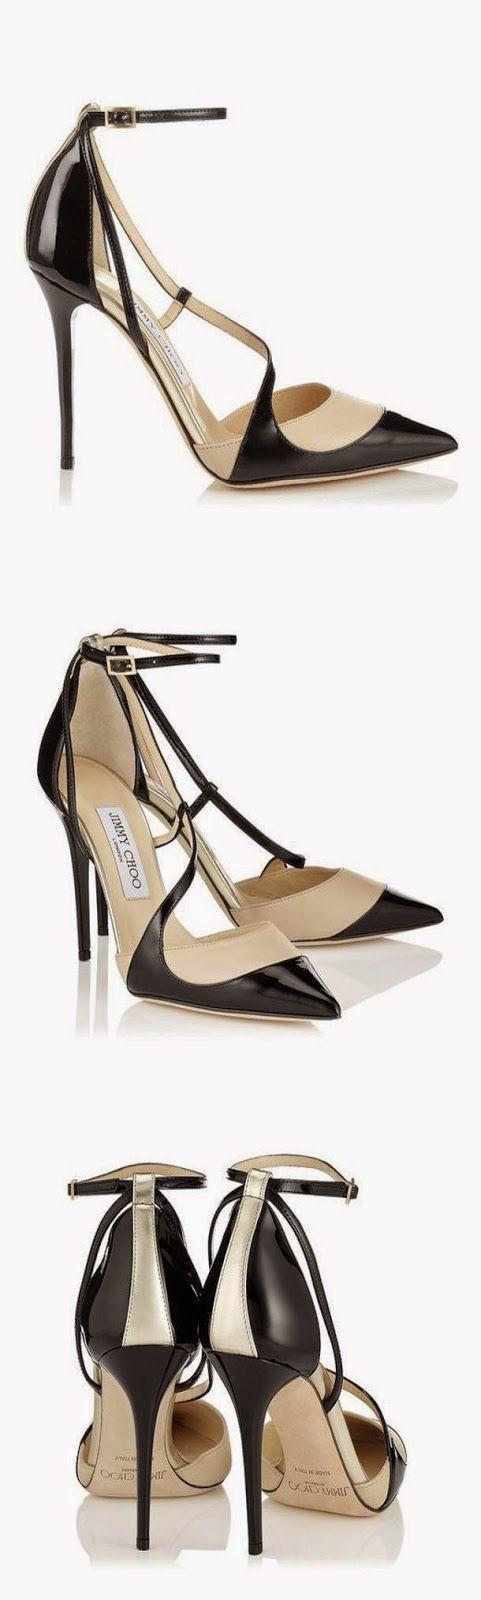 Jimmy Choo MUTYA Cruise Collection 2015 #shoes #beautyinthebag #omg #stilettoheelsjimmychoo #jimmychooheelsstilettos